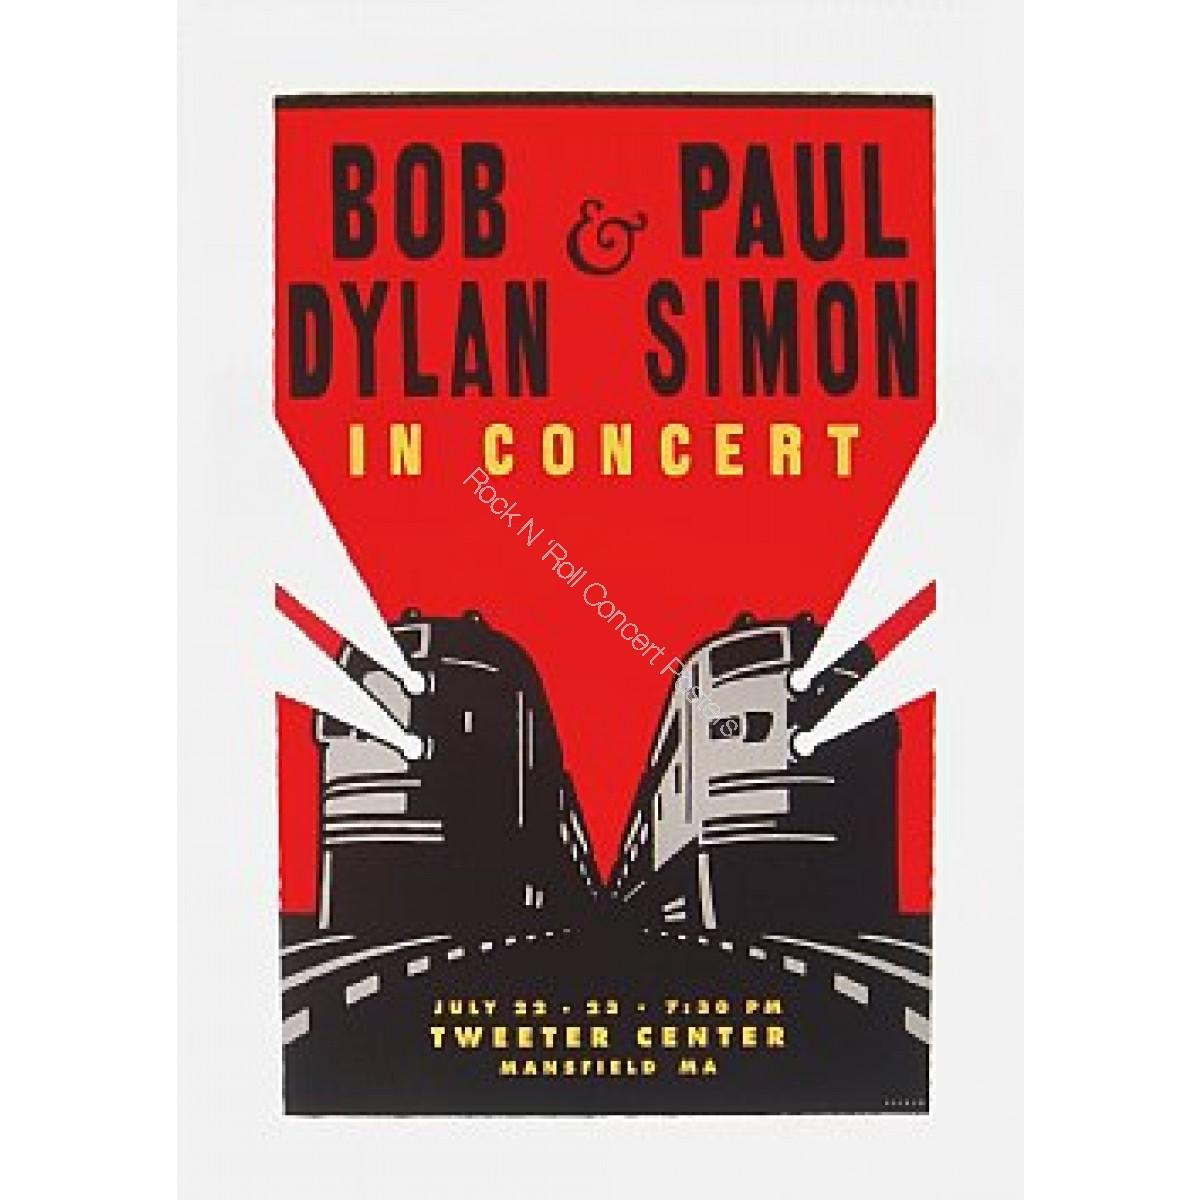 Bob Dylan & Paul Simon The Tweeter Center